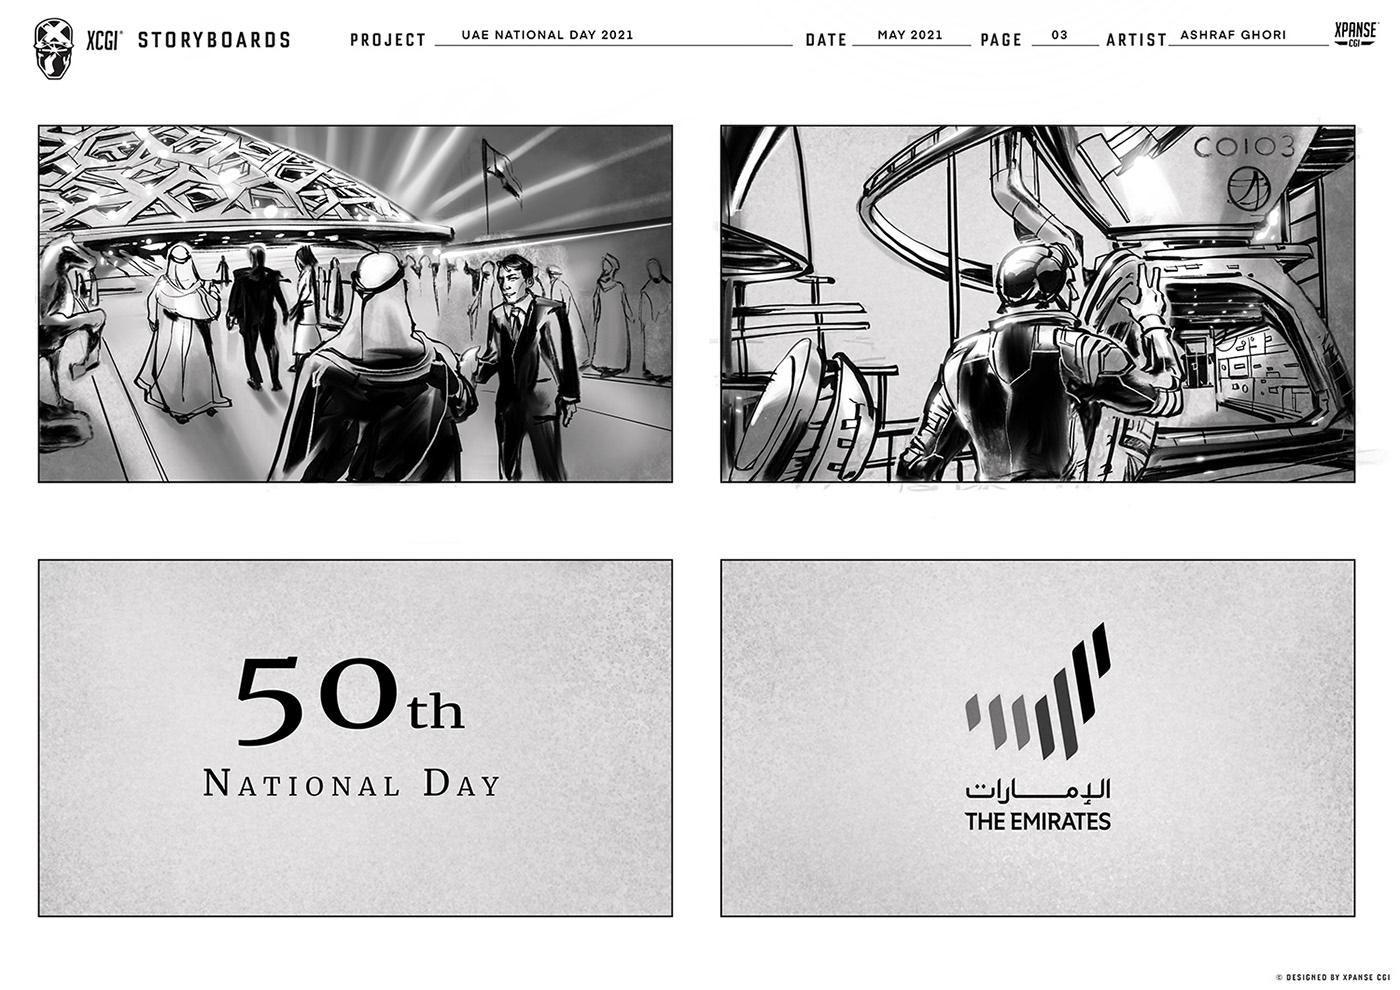 Abu Dhabi dubai National day SPIRIT OF THE UNION UAE